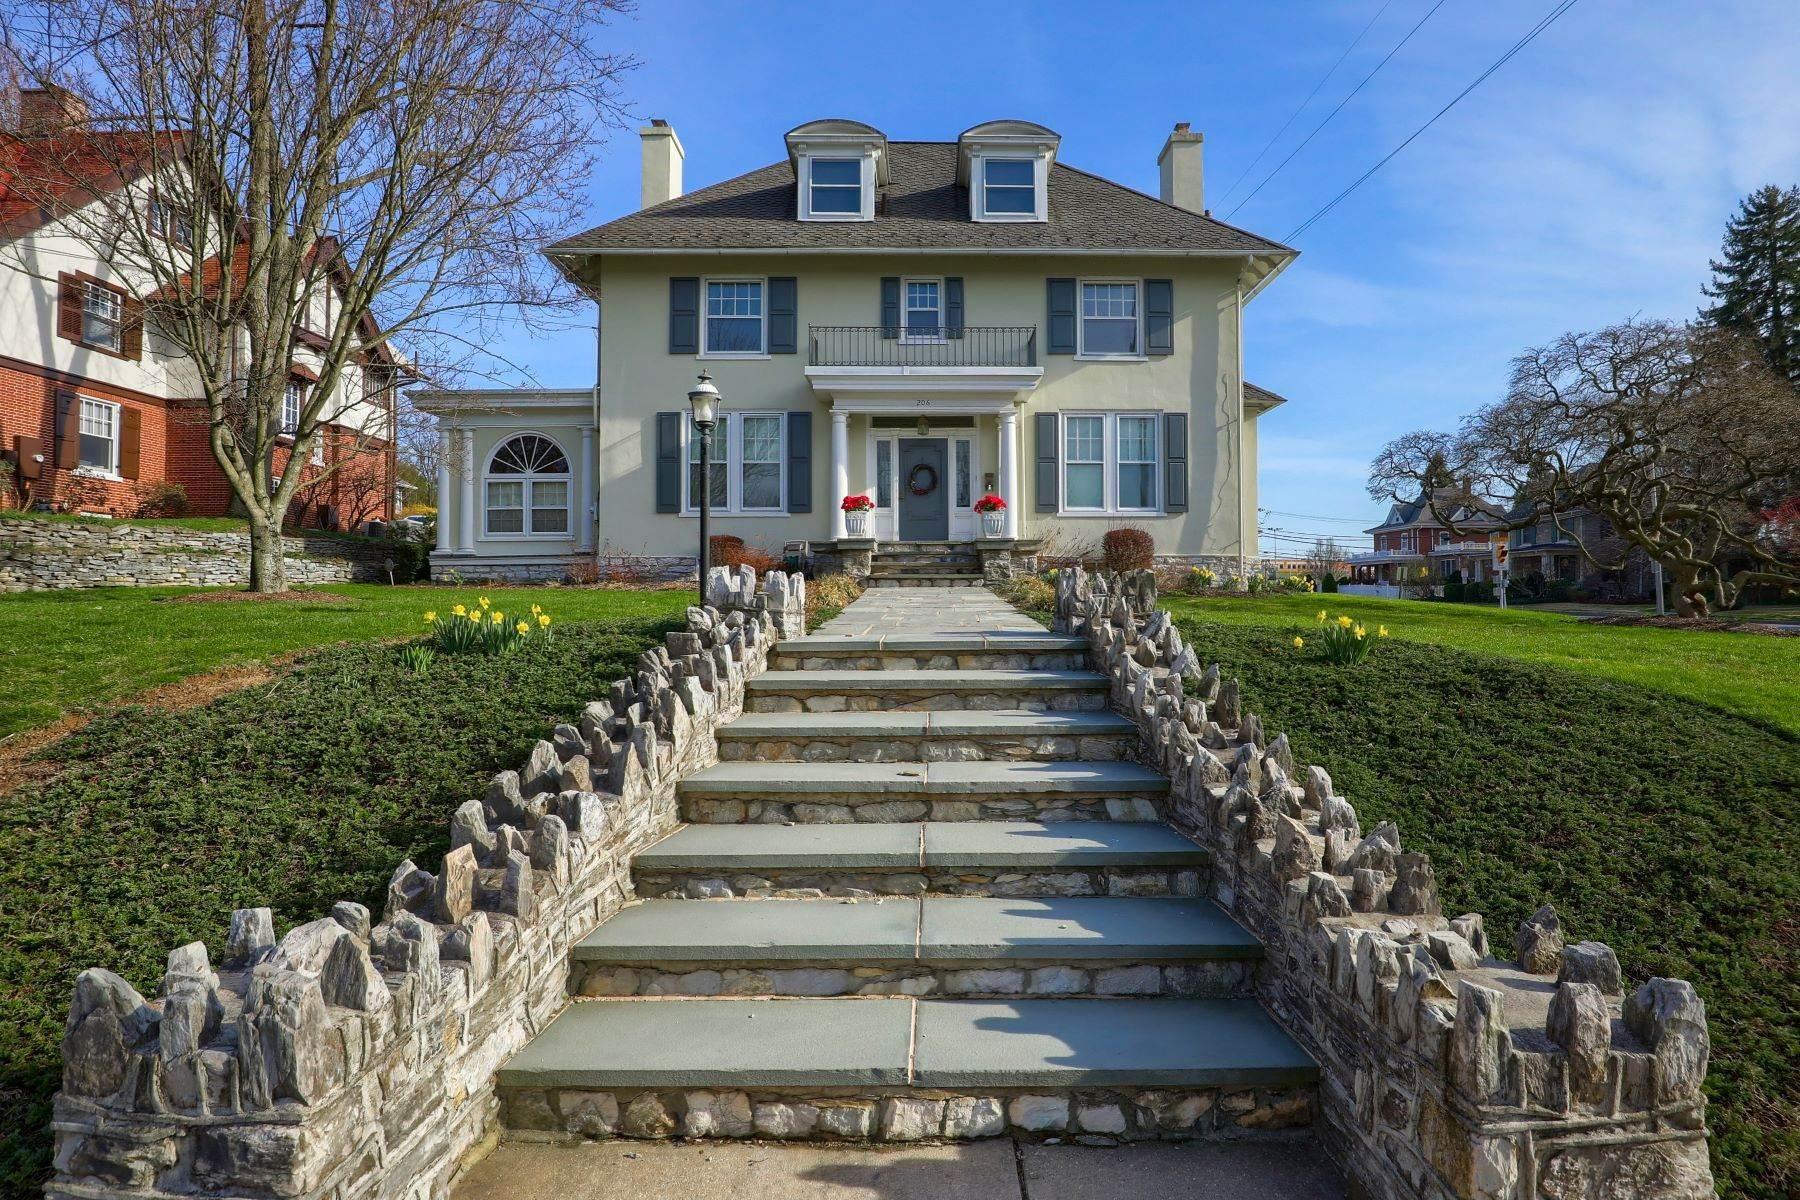 43. Single Family Homes for Sale at 206 E Granada Ave Hershey, Pennsylvania 17033 United States